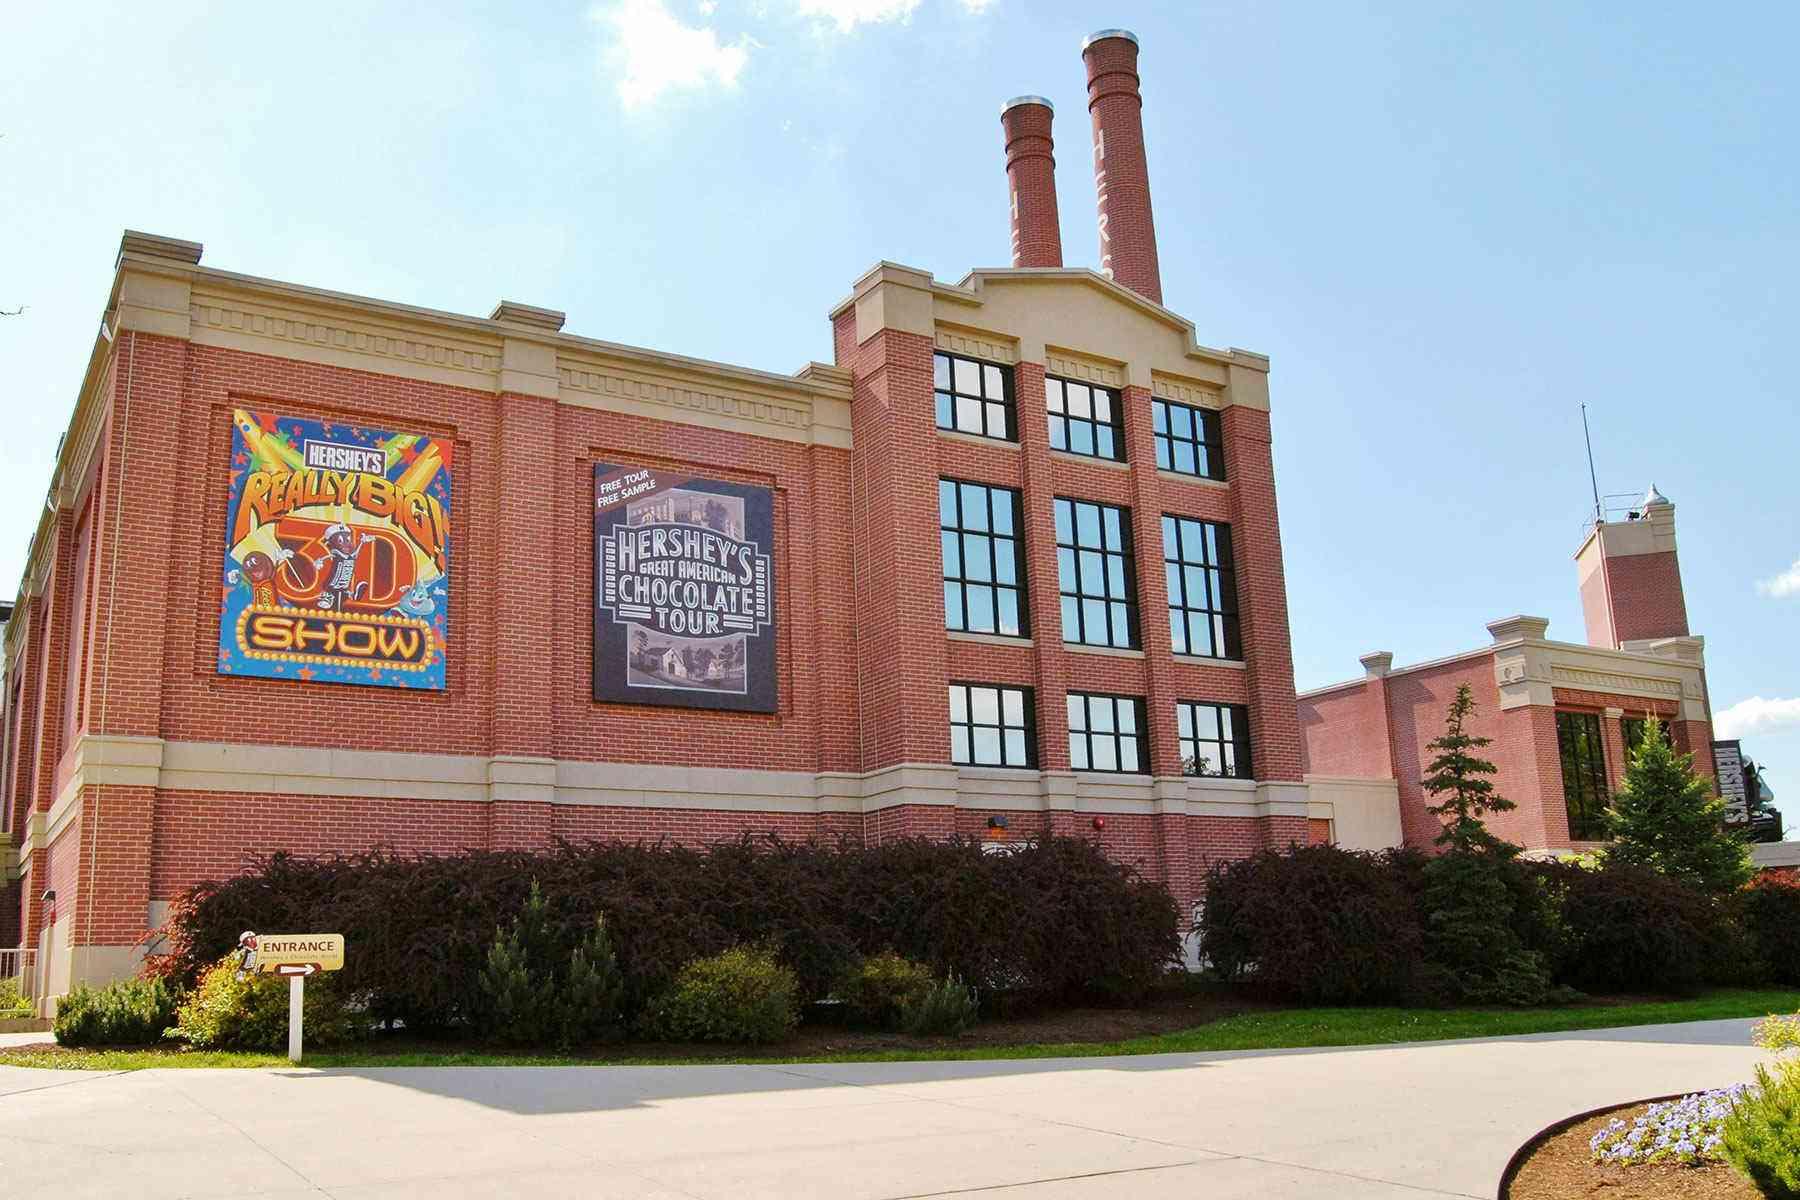 Wonka Candy Factory Tours